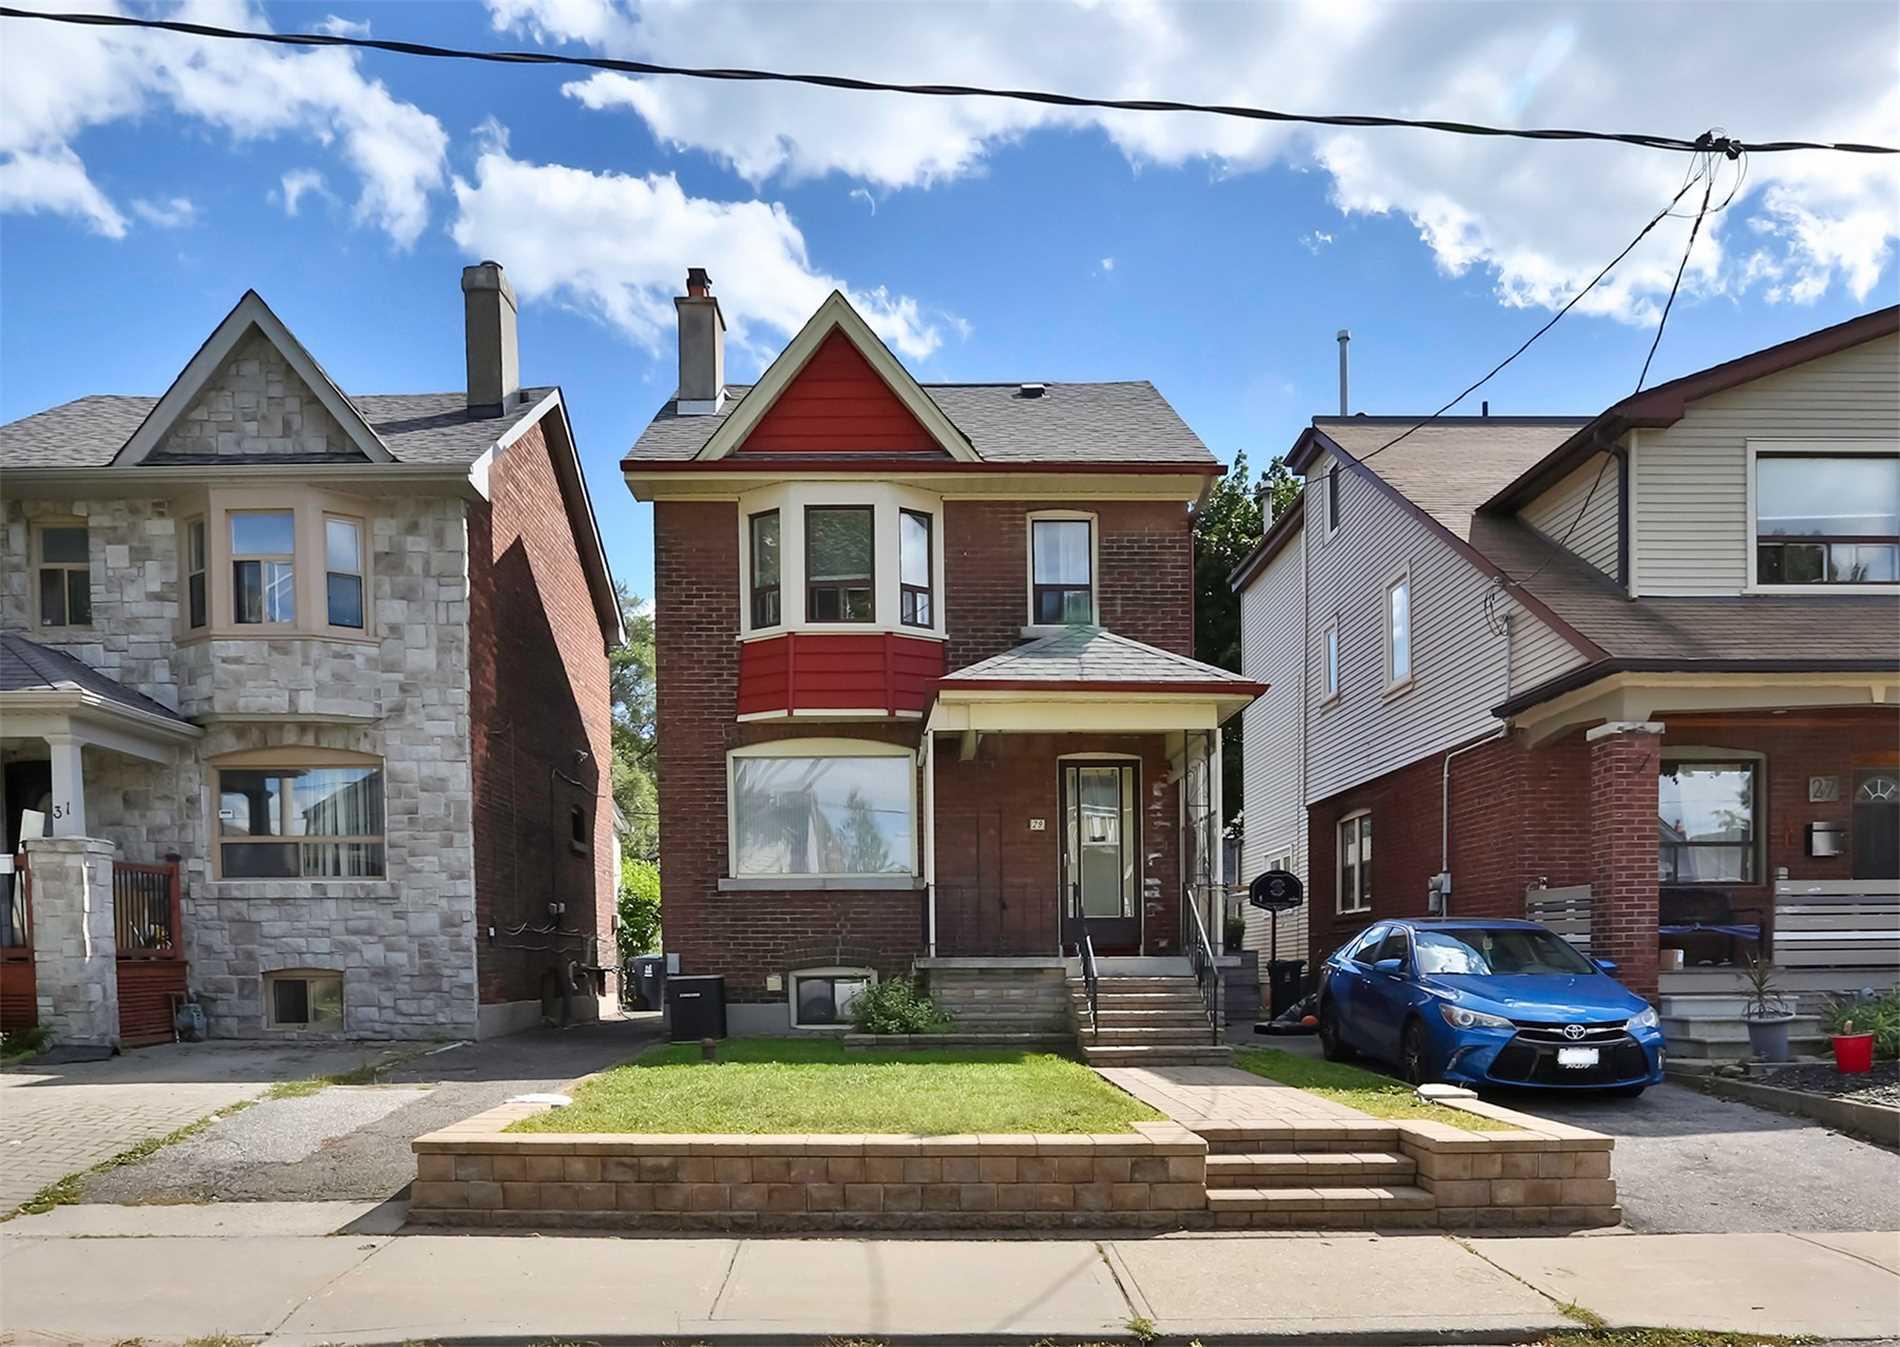 29 Newmarket Ave, Toronto, Ontario M4C1V8, 3 Bedrooms Bedrooms, 6 Rooms Rooms,2 BathroomsBathrooms,Detached,For Sale,Newmarket,E4901158